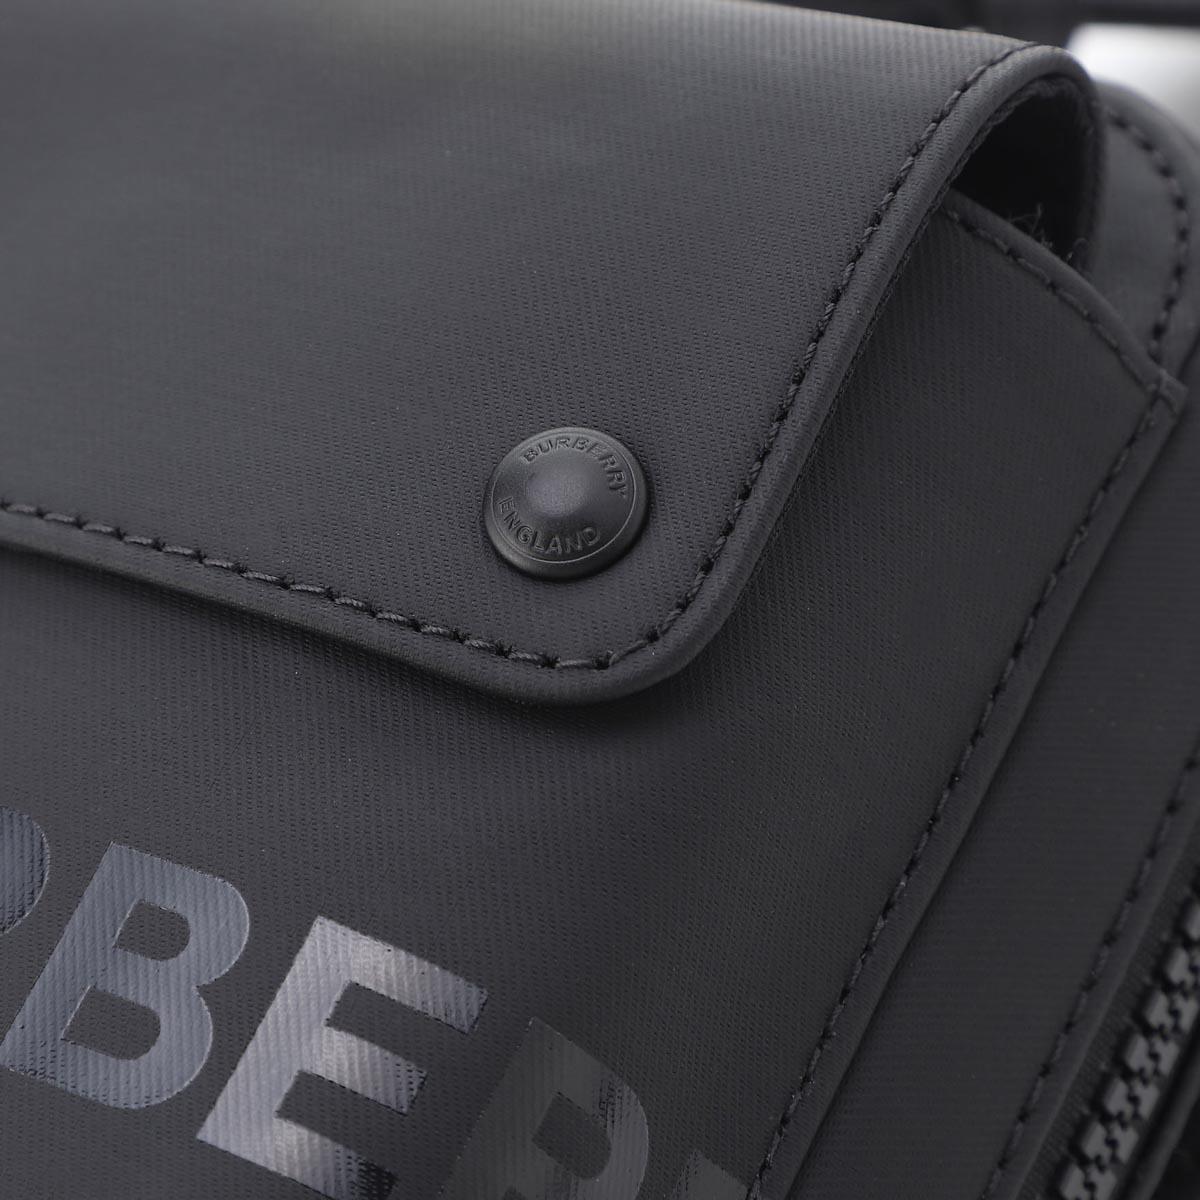 BURBERRY バーバリー ポーチ/サコッシュ フォンホルダー/HORSEFERRY PRINT メンズ